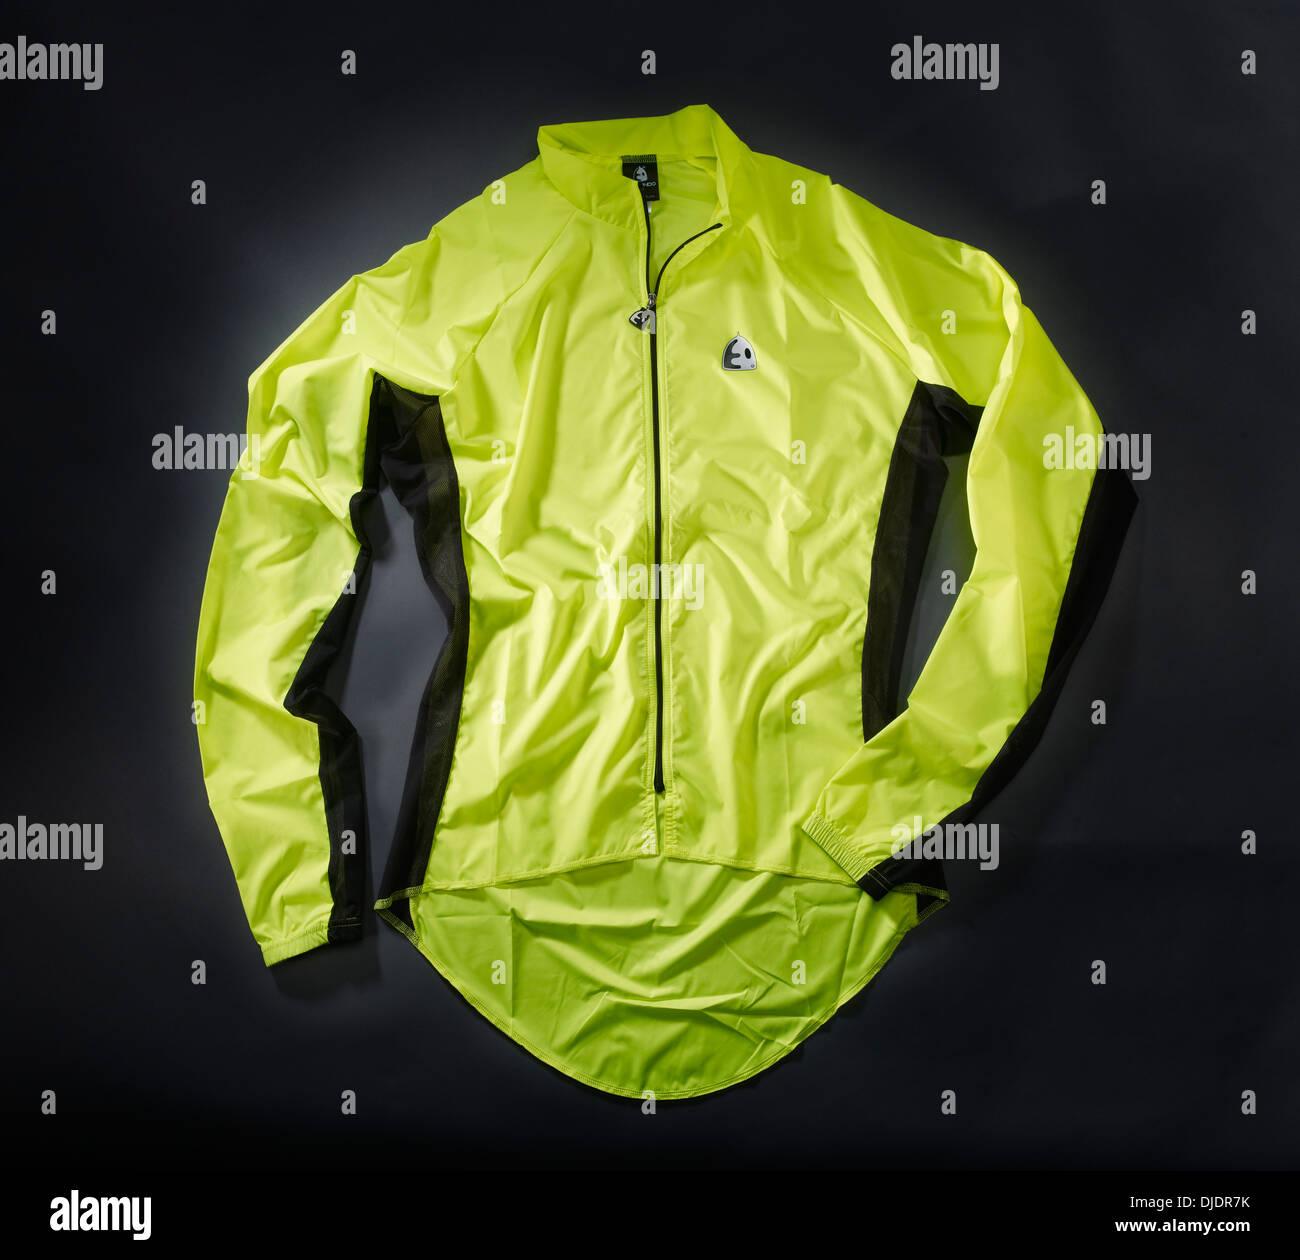 Leichte Regenjacke Radsport Stockbild